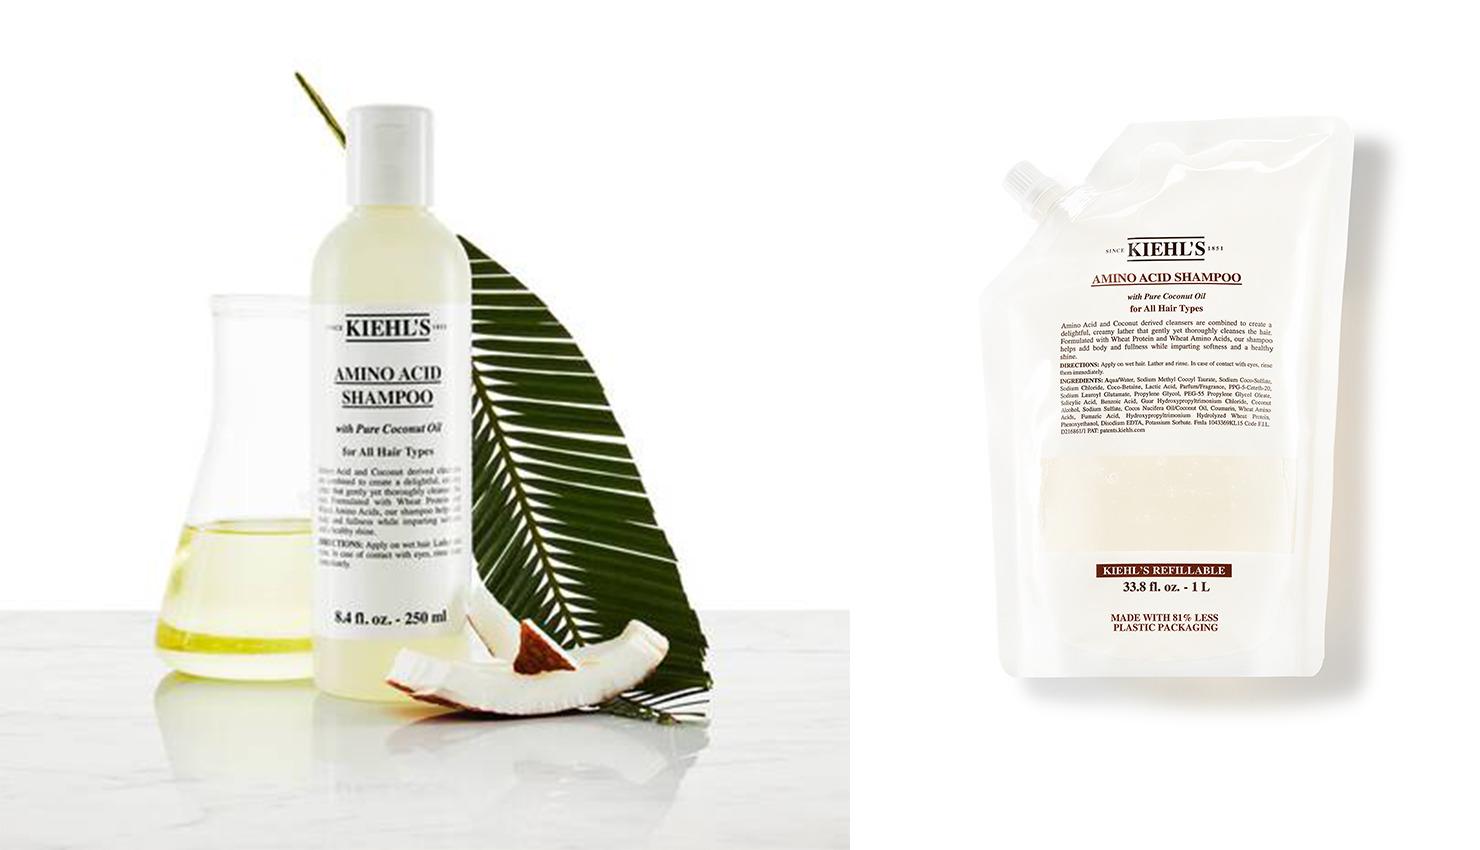 kiehls-champu-natural-productos-cabello-verano-magazinehorse